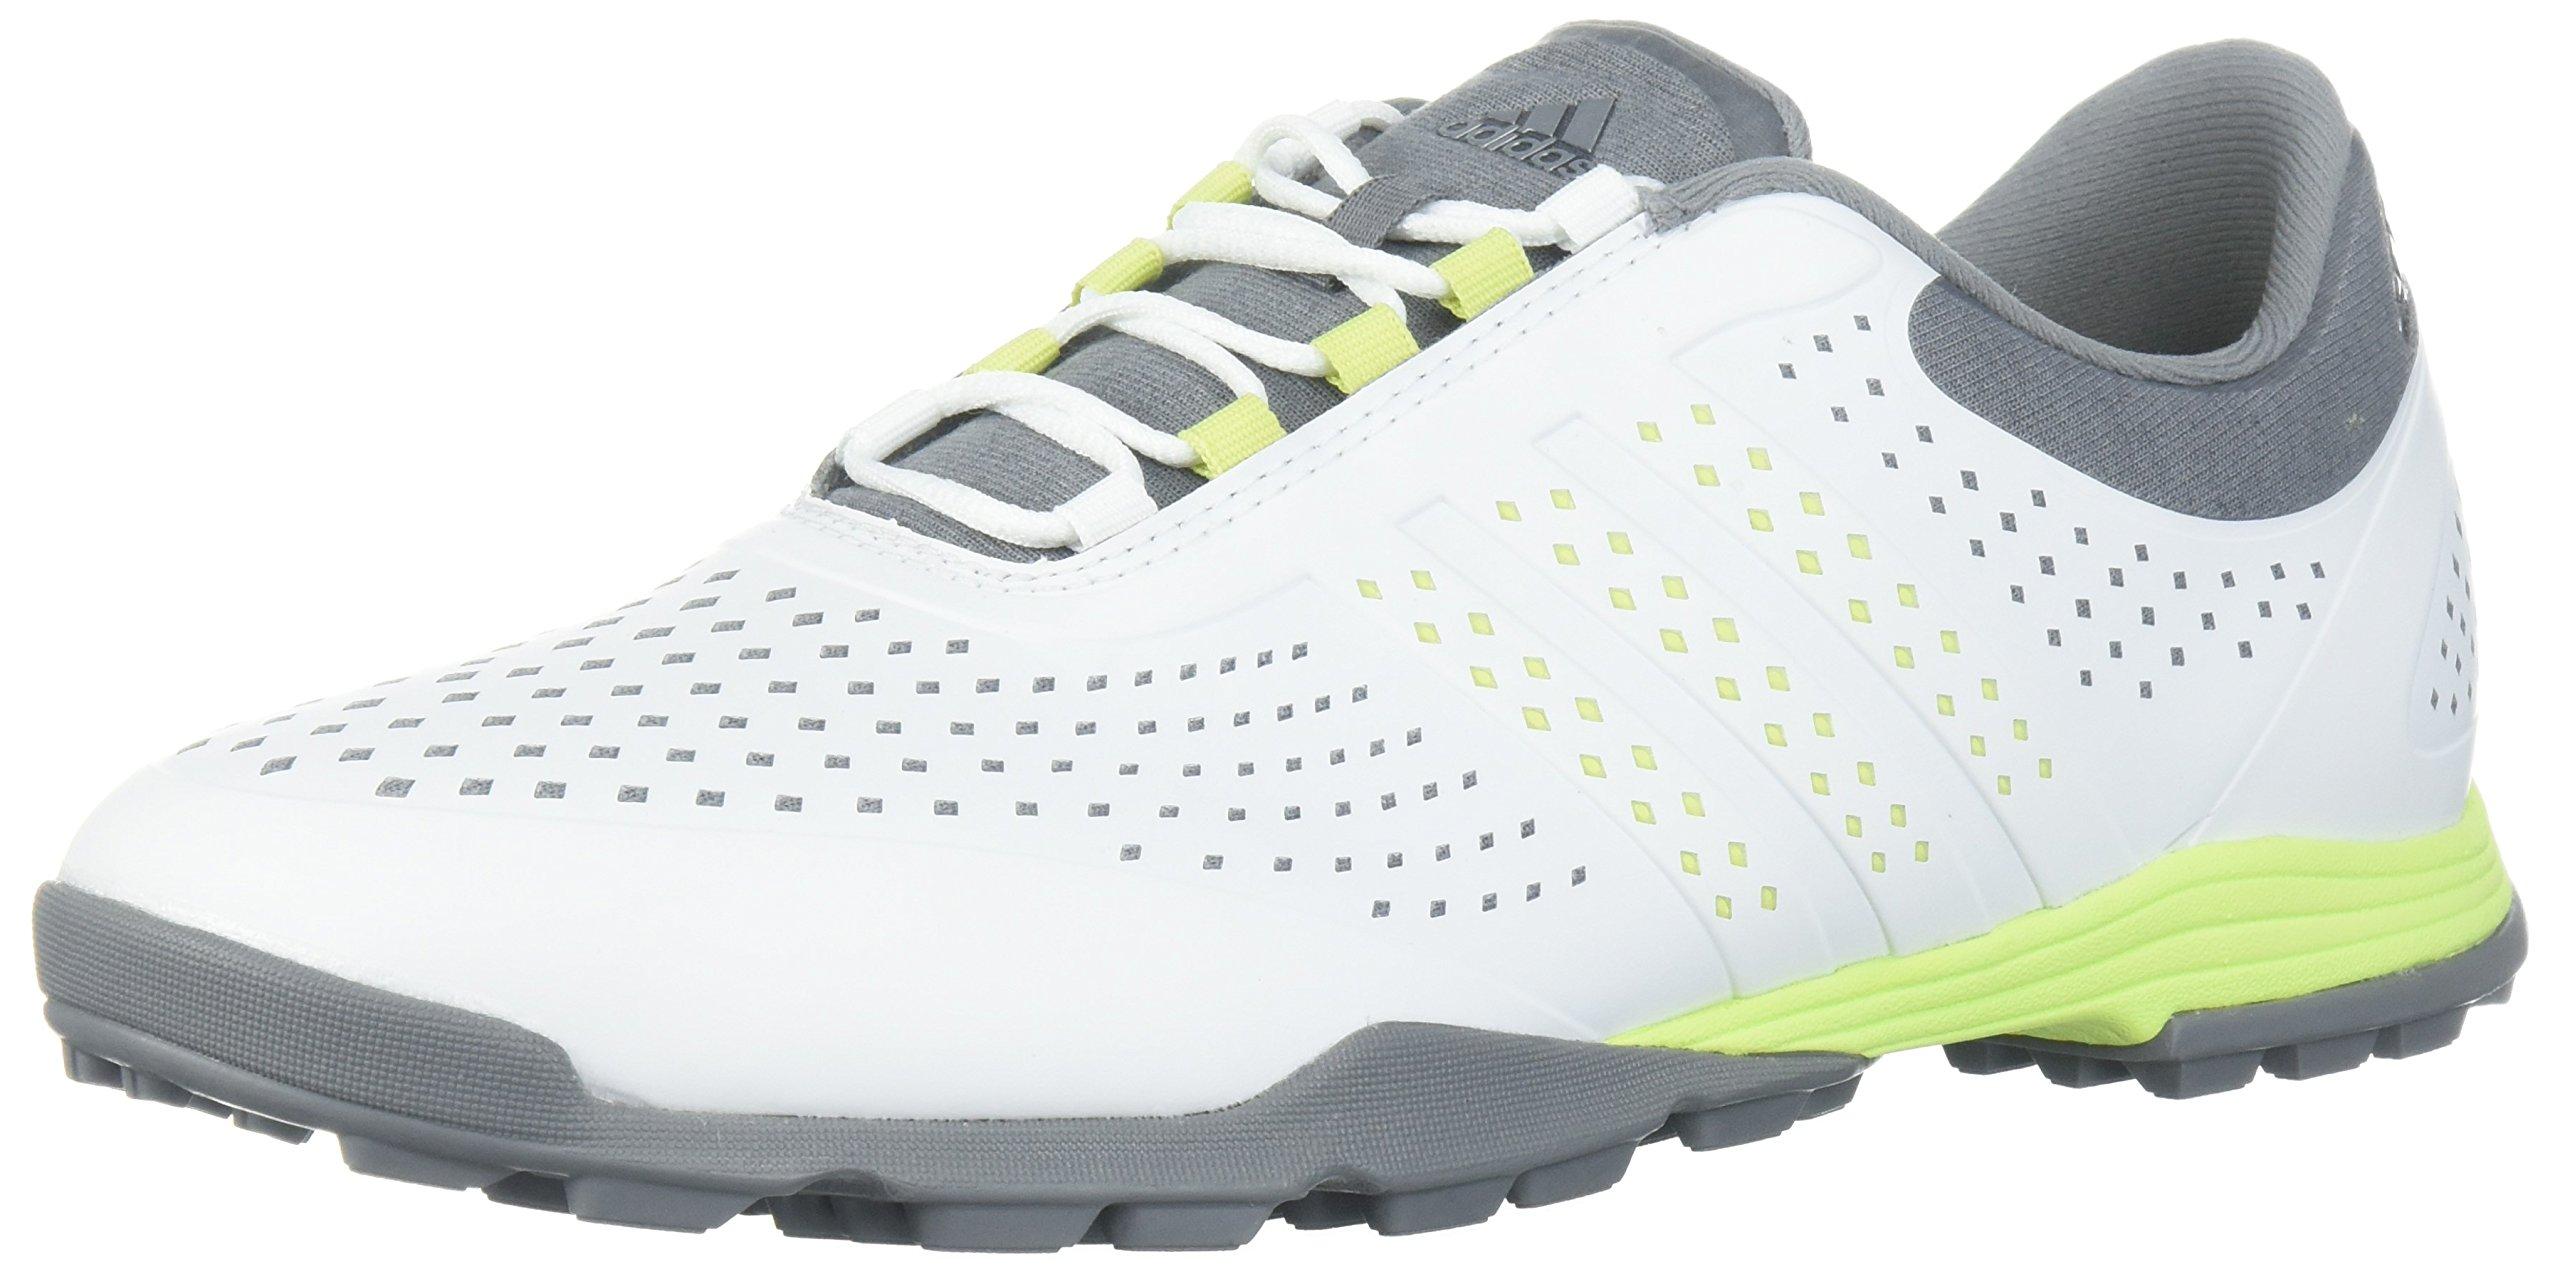 adidas Women's Adipure Sport Golf Shoe, White/Semi Frozen Yellow/Grey, 7 Medium US by adidas